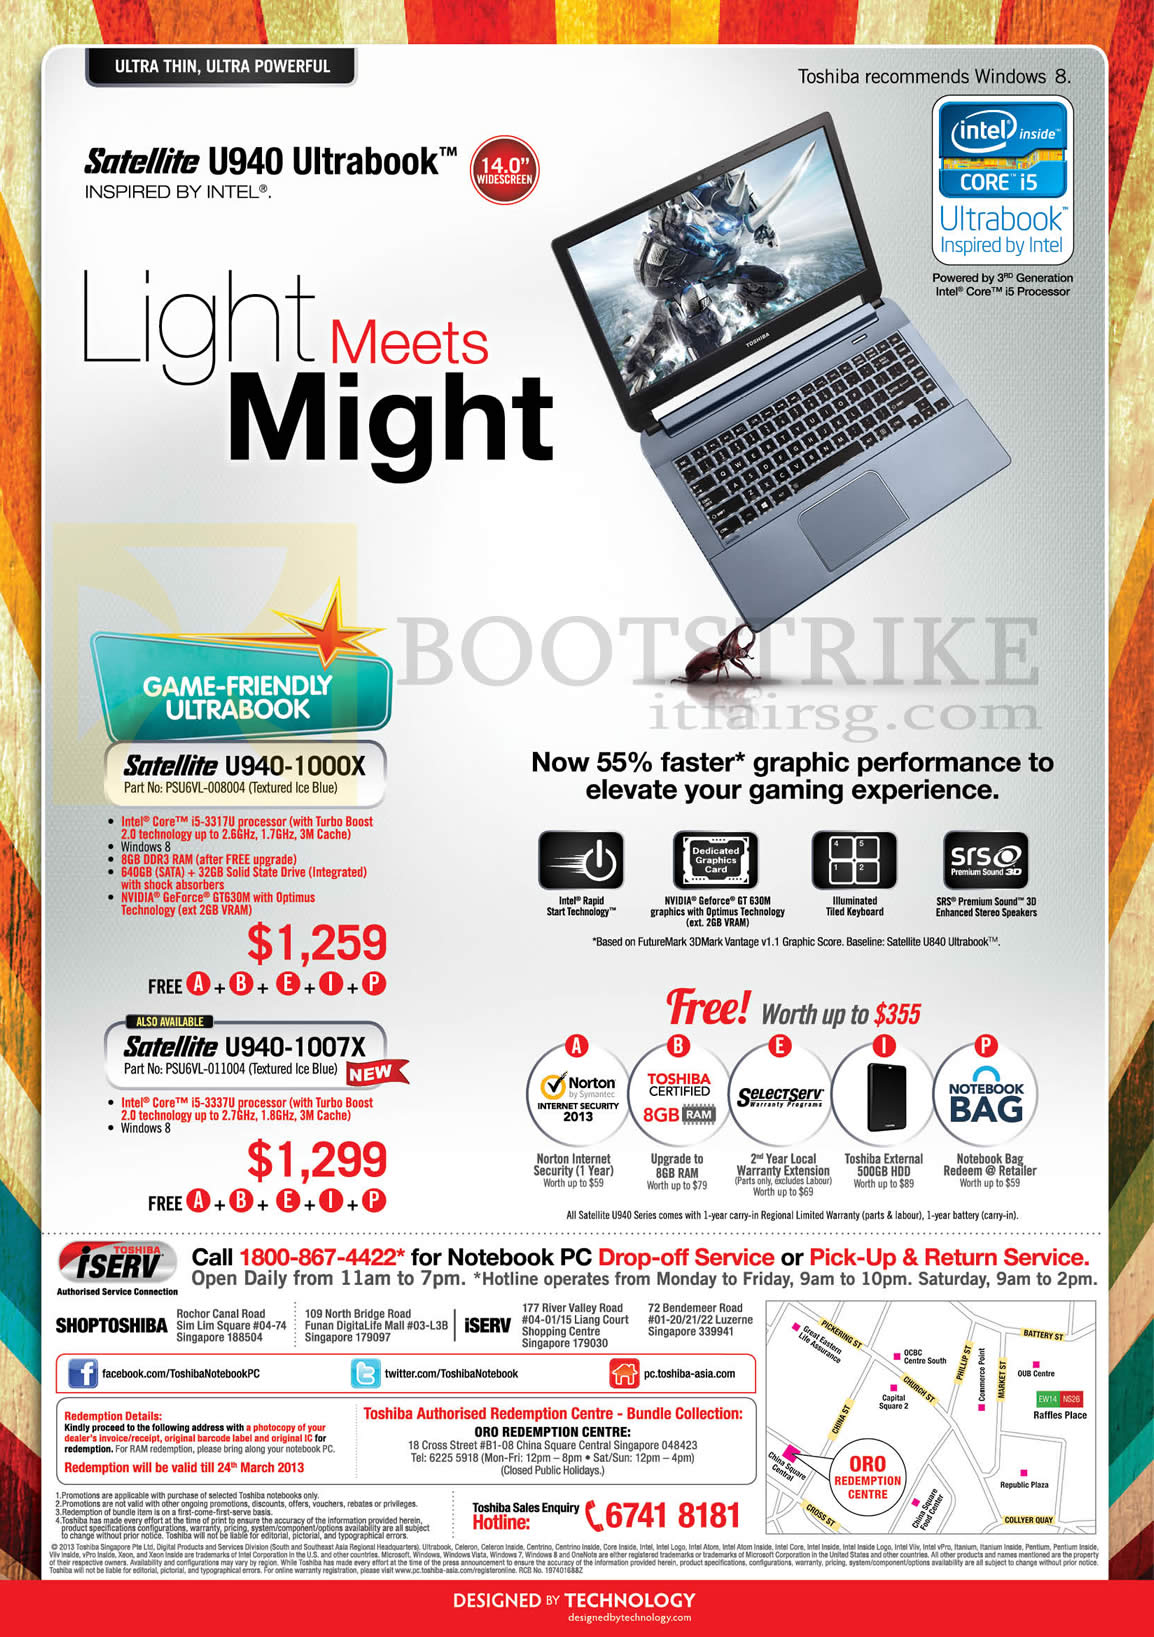 IT SHOW 2013 price list image brochure of Toshiba Notebooks Satellite U940-1000X, U940-1007X